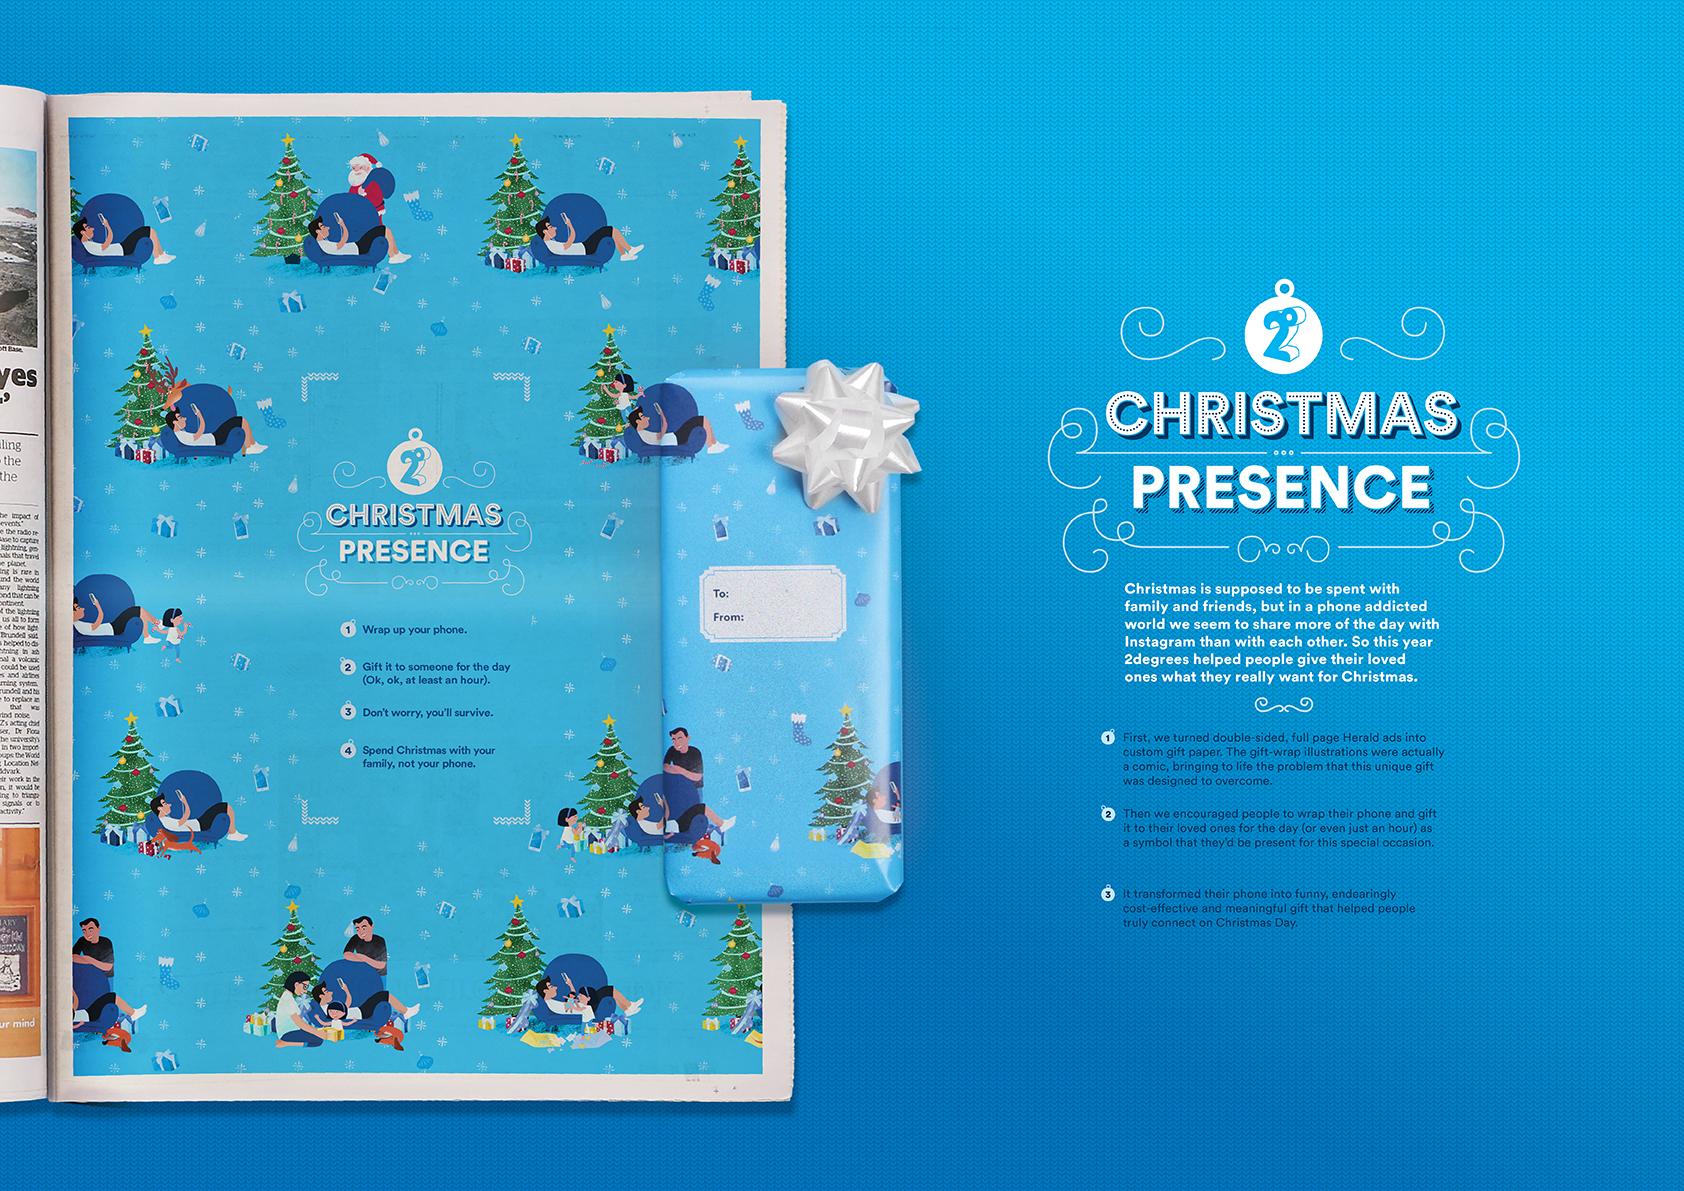 ChristmasPresenceBoard_sized.jpg